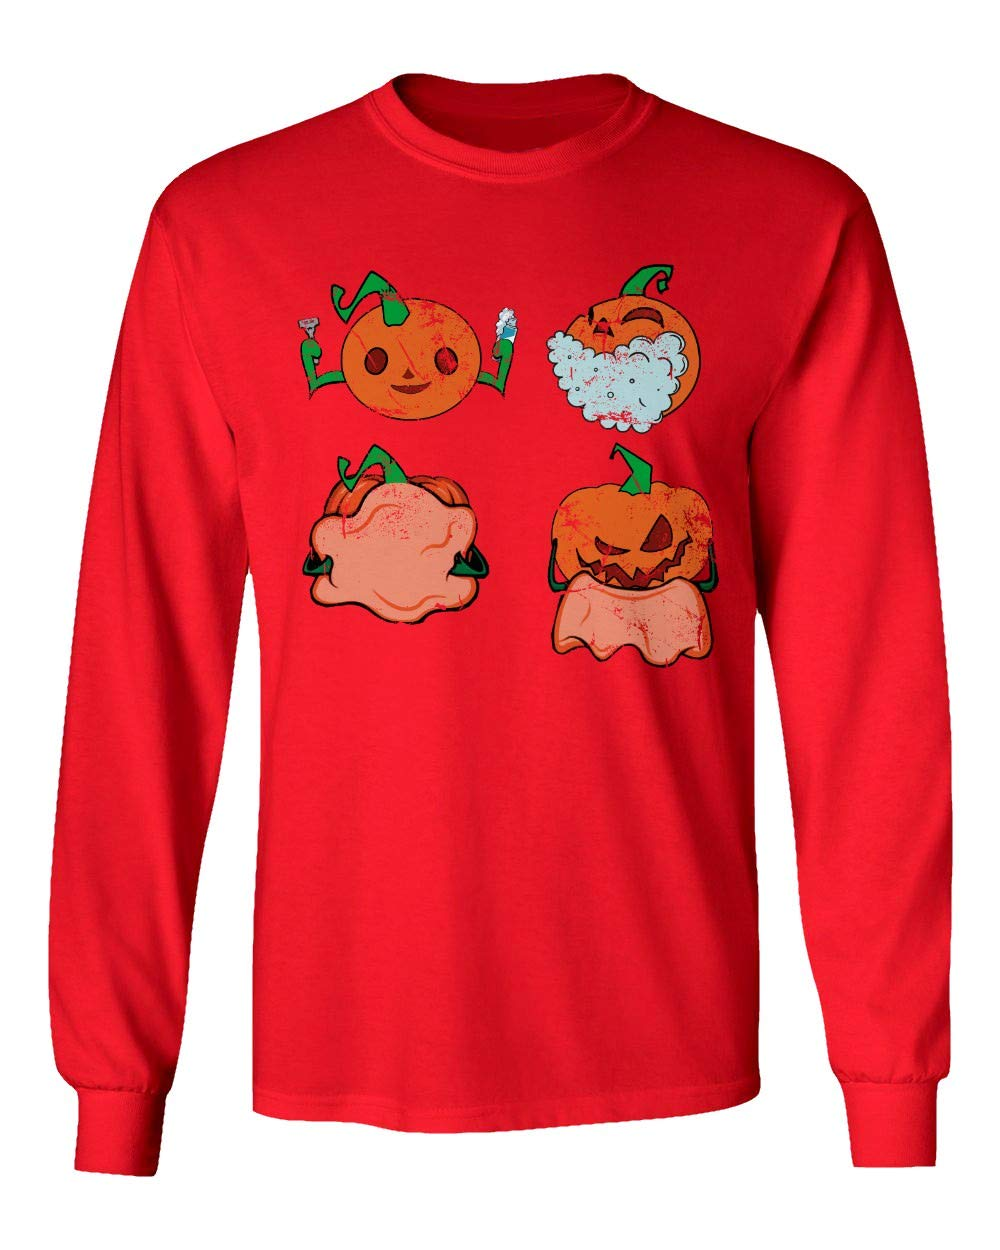 New Novelty Shirt Pumpkin Shaving Shirt Jack O Lantern Funny Halloween S Tshirt